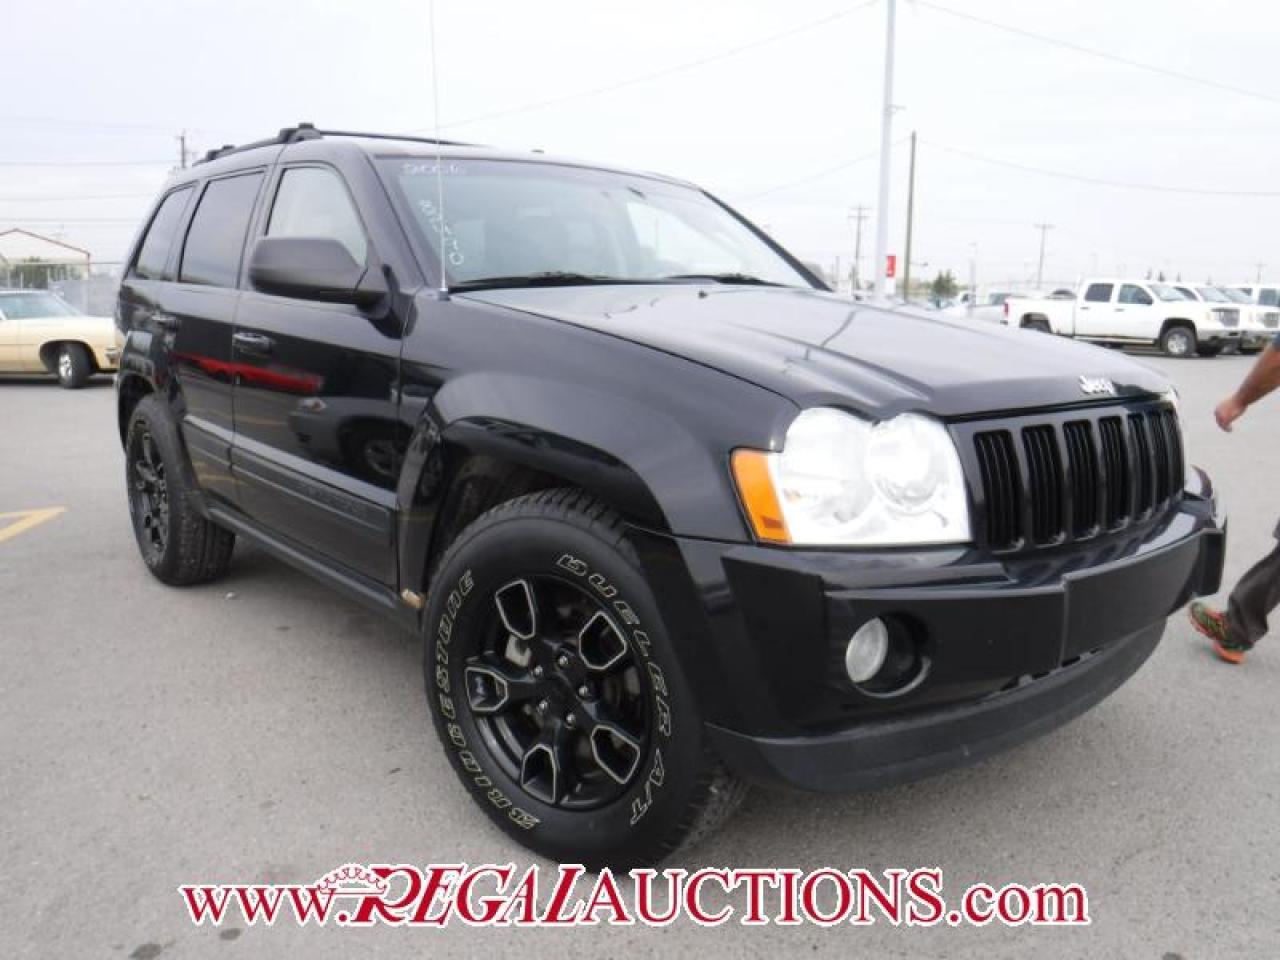 Photo of Black 2006 Jeep Grand Cherokee